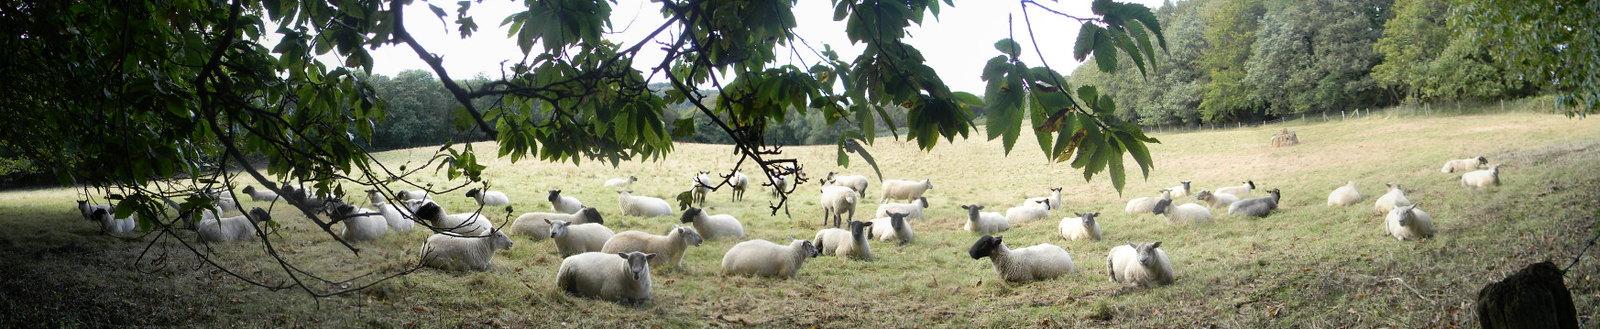 Sheep in the shade Haslemere Circular